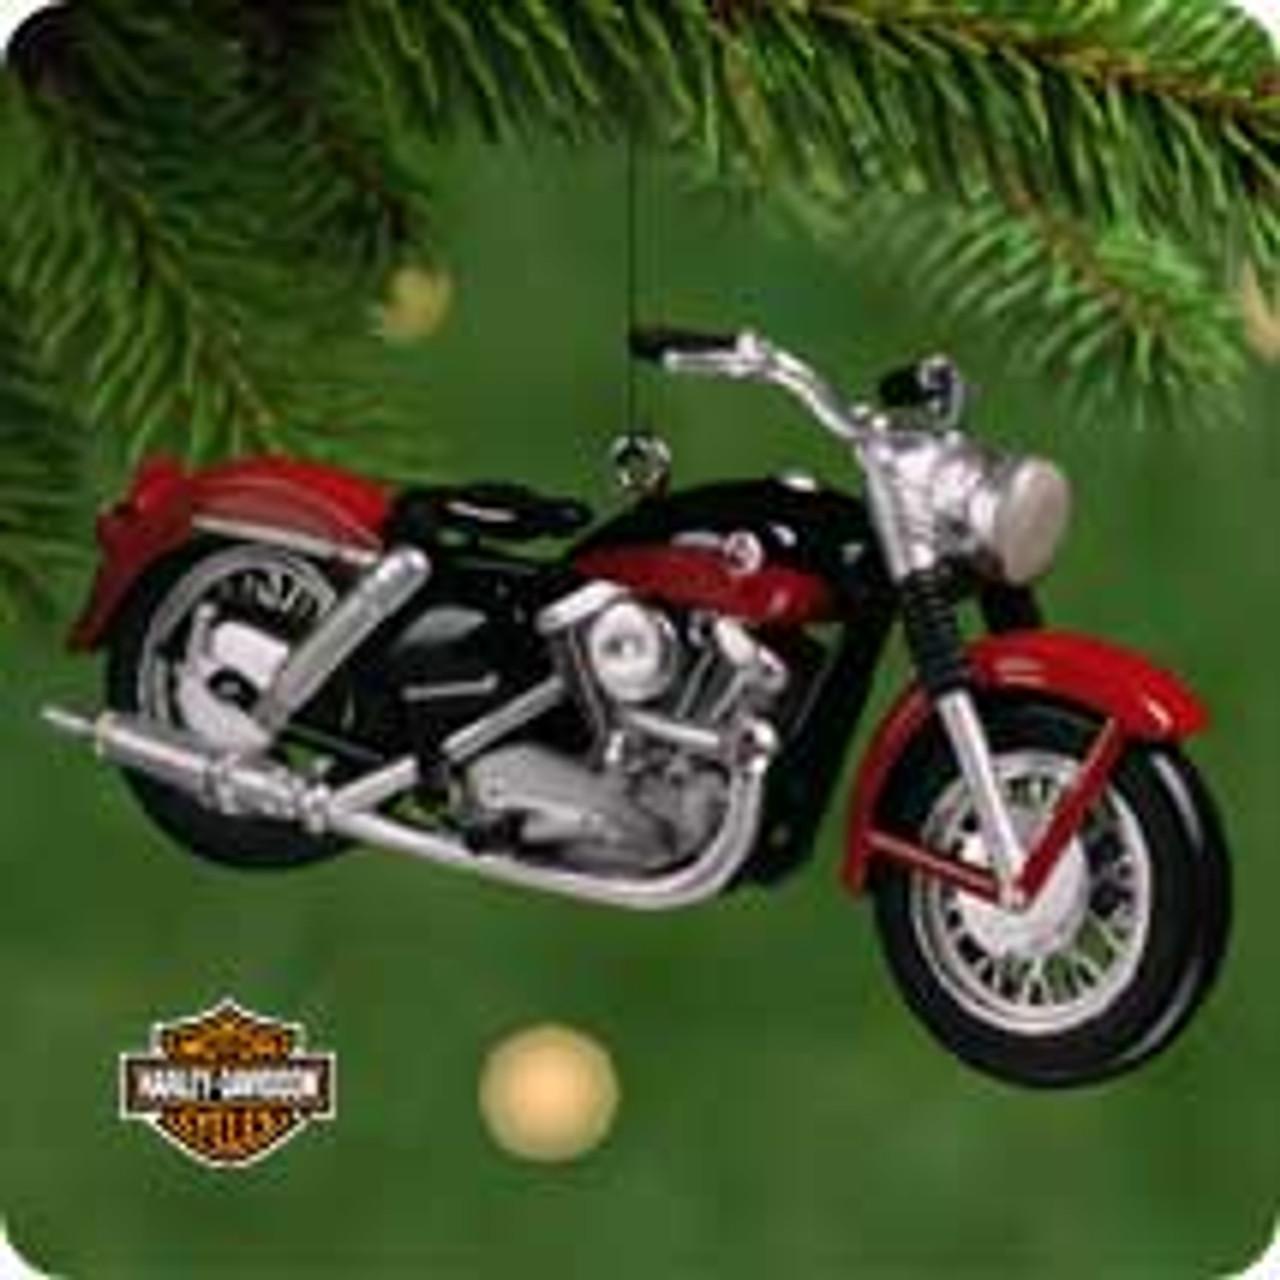 2001 Harley Davidson 3 57 Xl Sportser Hallmark Ornament The Ornament Shop